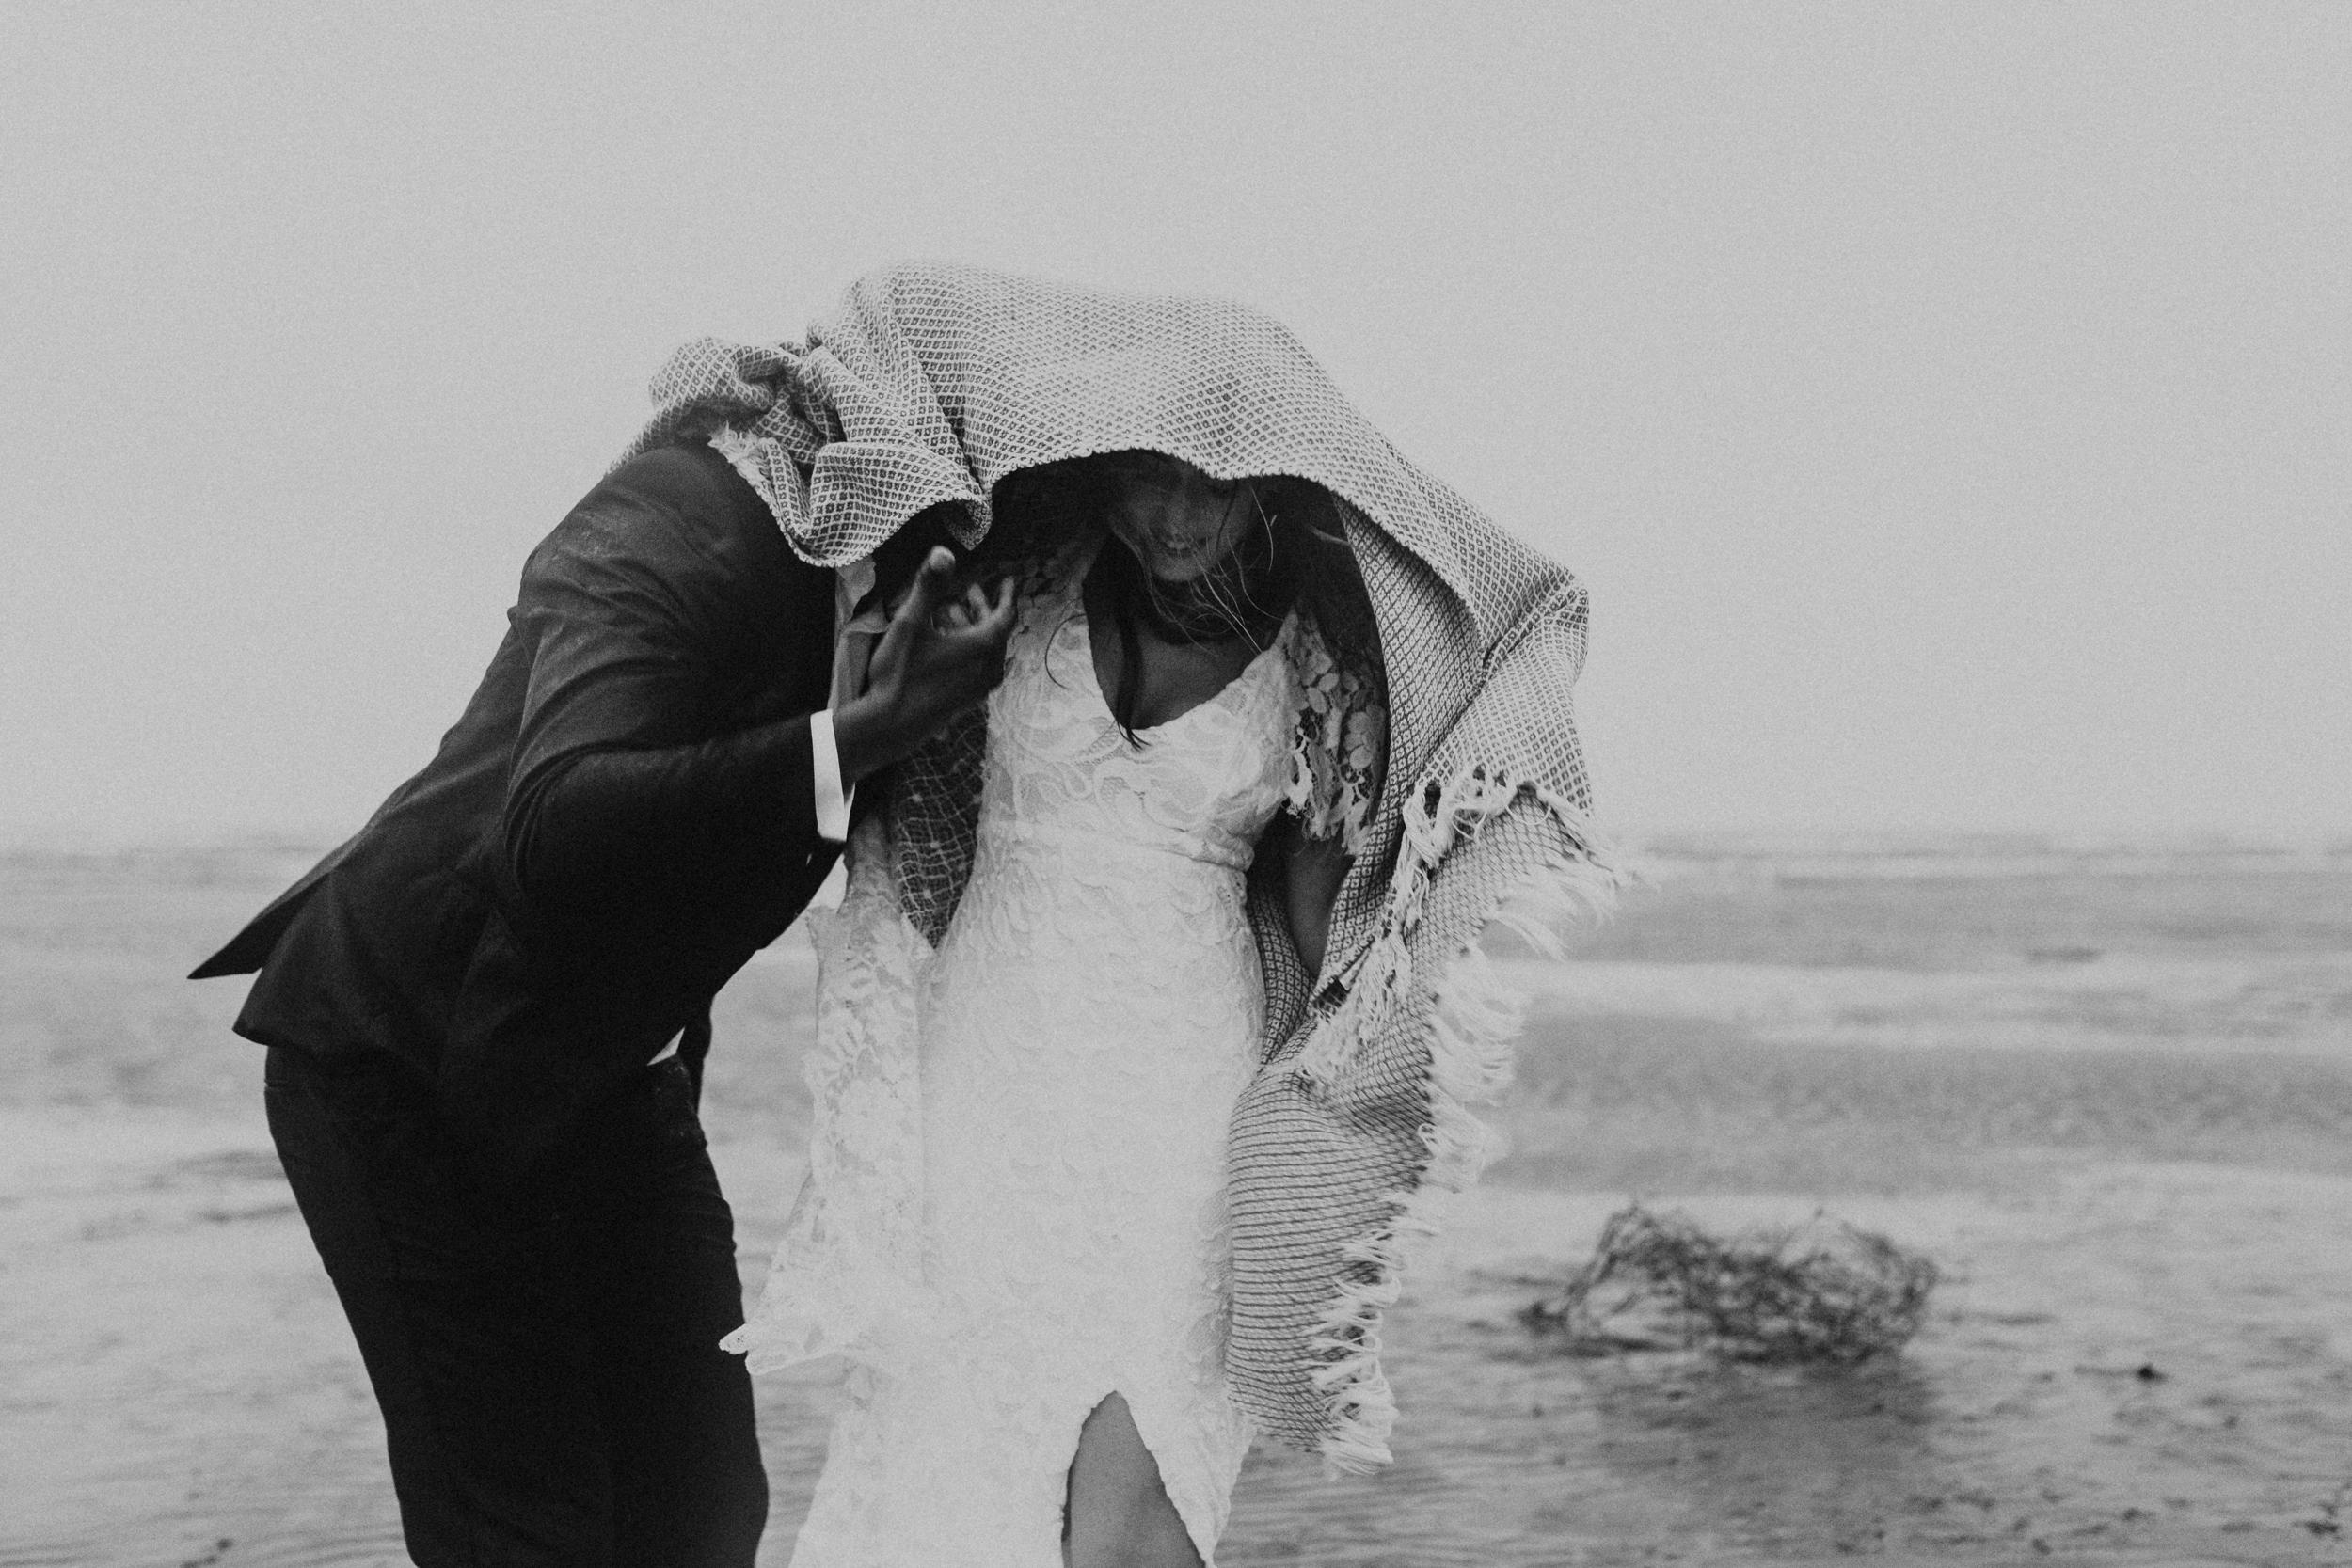 Emma-Tate-Stormy-Norfolk-Beach-Wedding-Shoot-Darina-Stoda-Photography-75.jpg